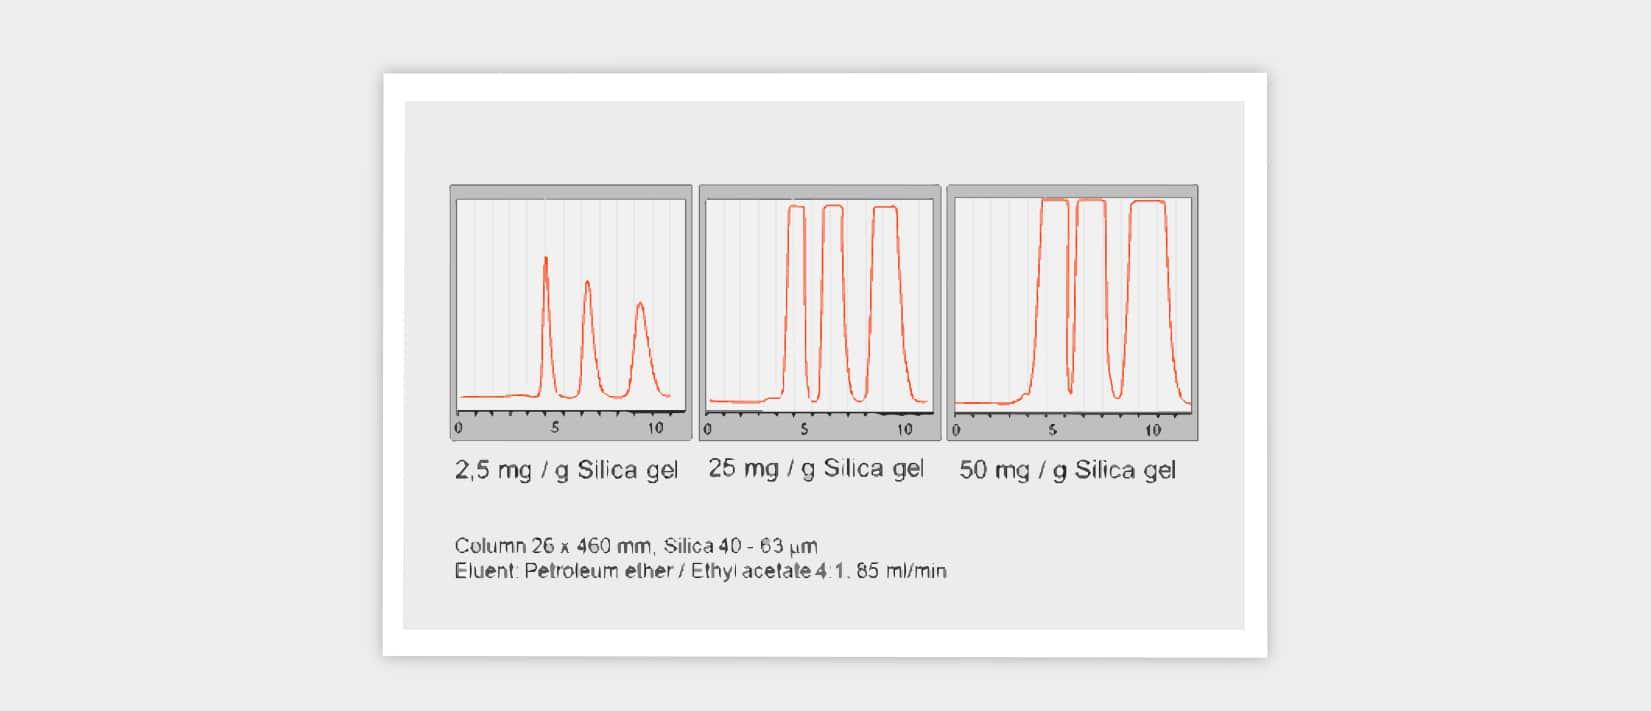 sample load, sample overload, preparative chromatography, flash chromatography, column efficiency, plate height, resolution, prep HPLC